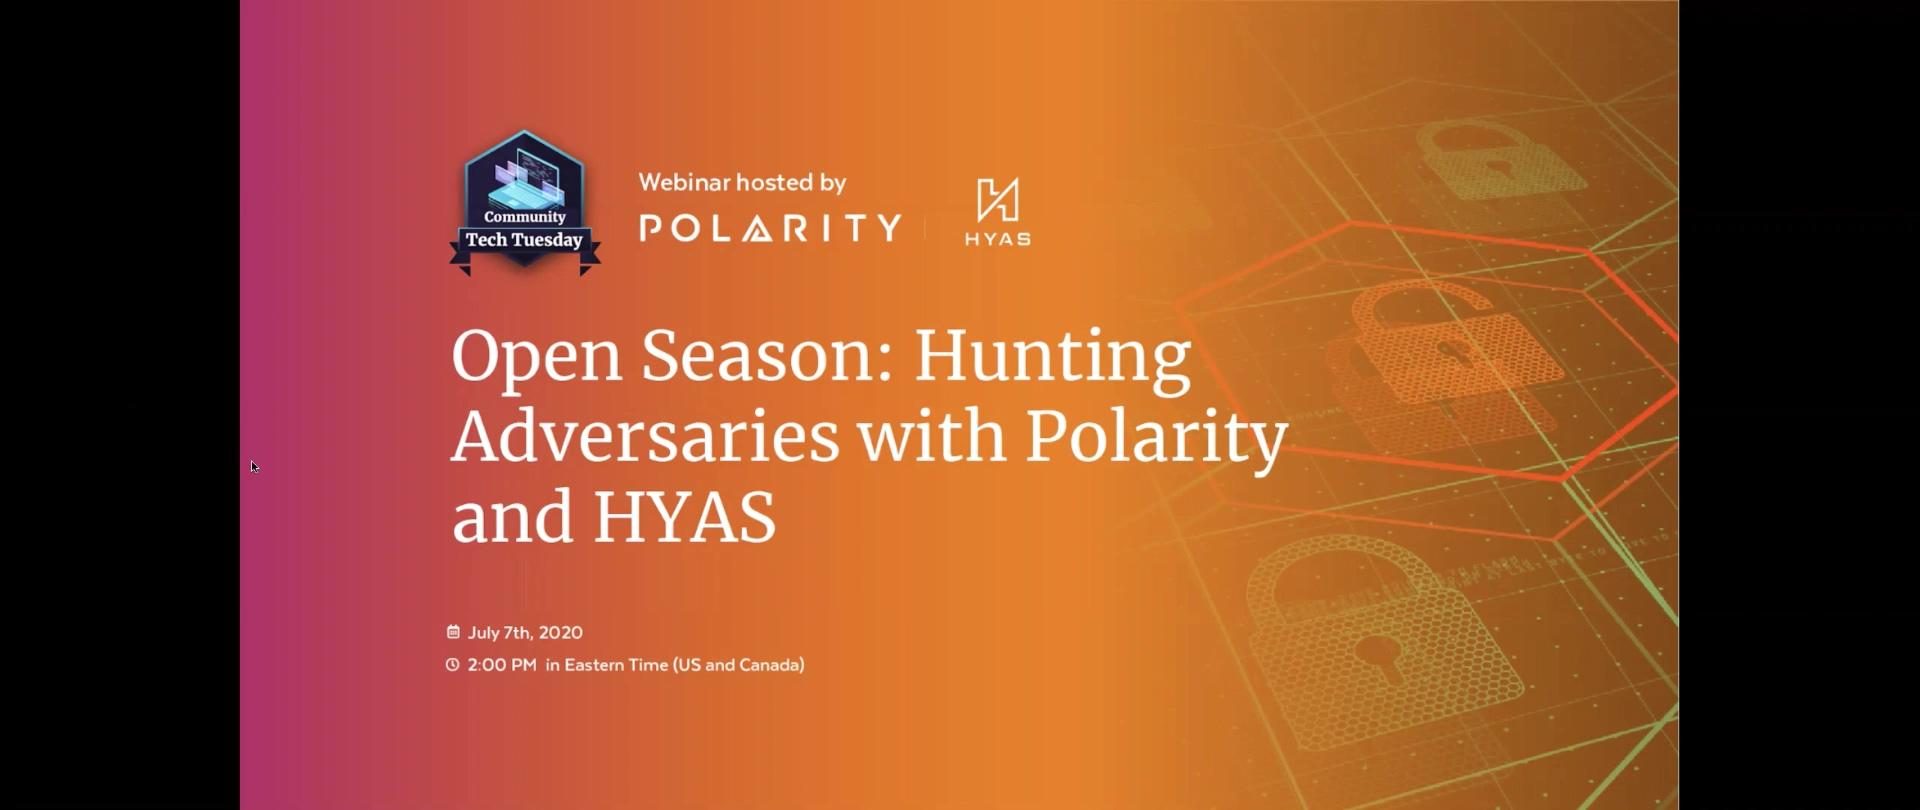 Polarity-HYAS-TechTuesday-Webinar-thumb-1